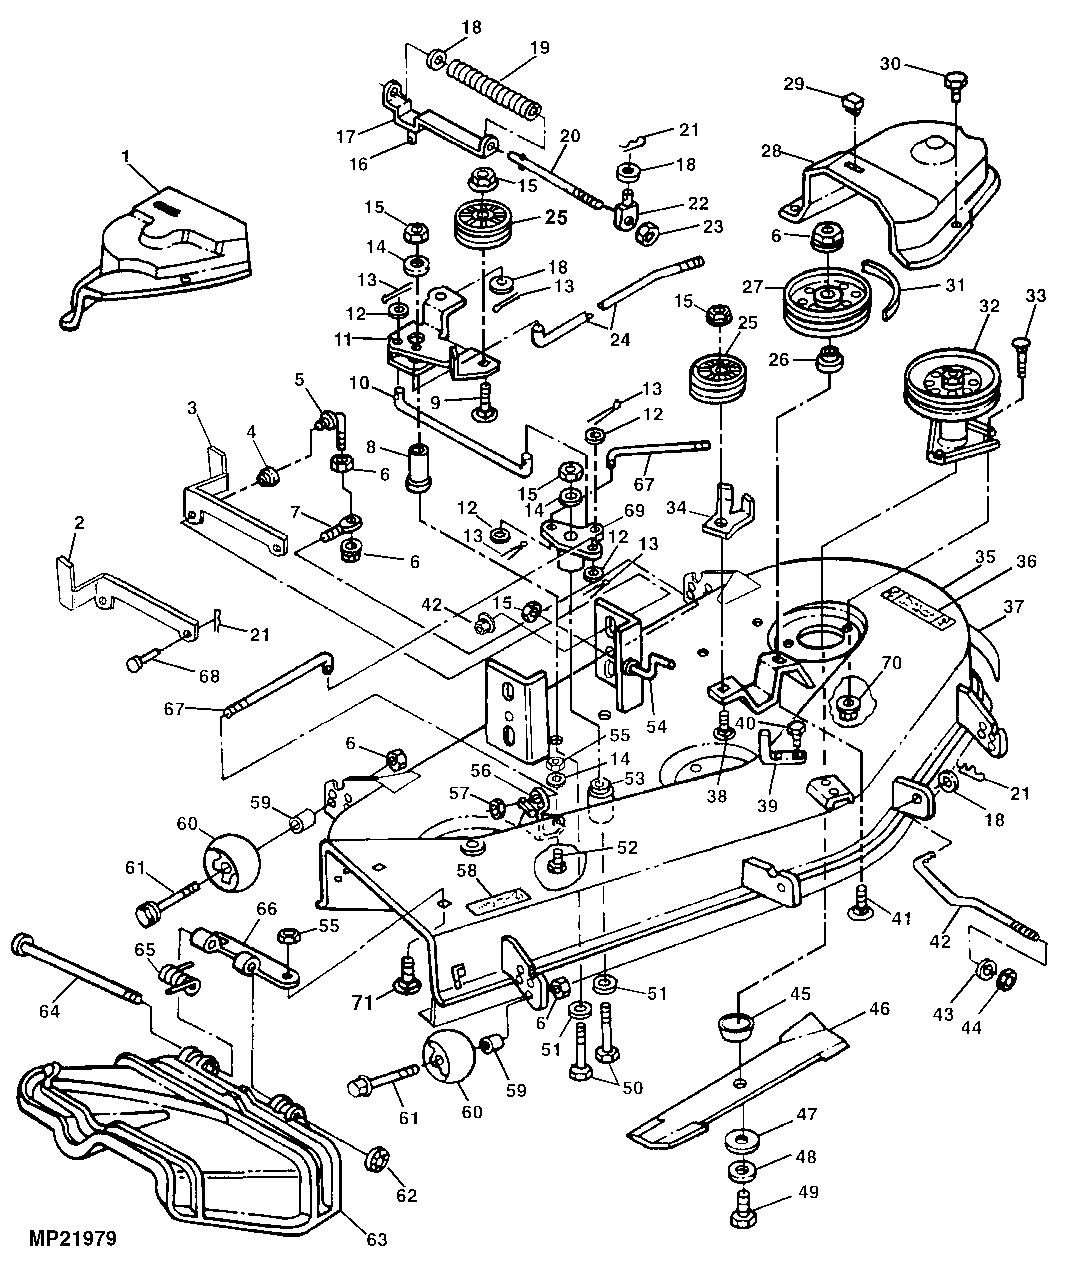 John Deere Lt133 Deck Parts John Deere Parts